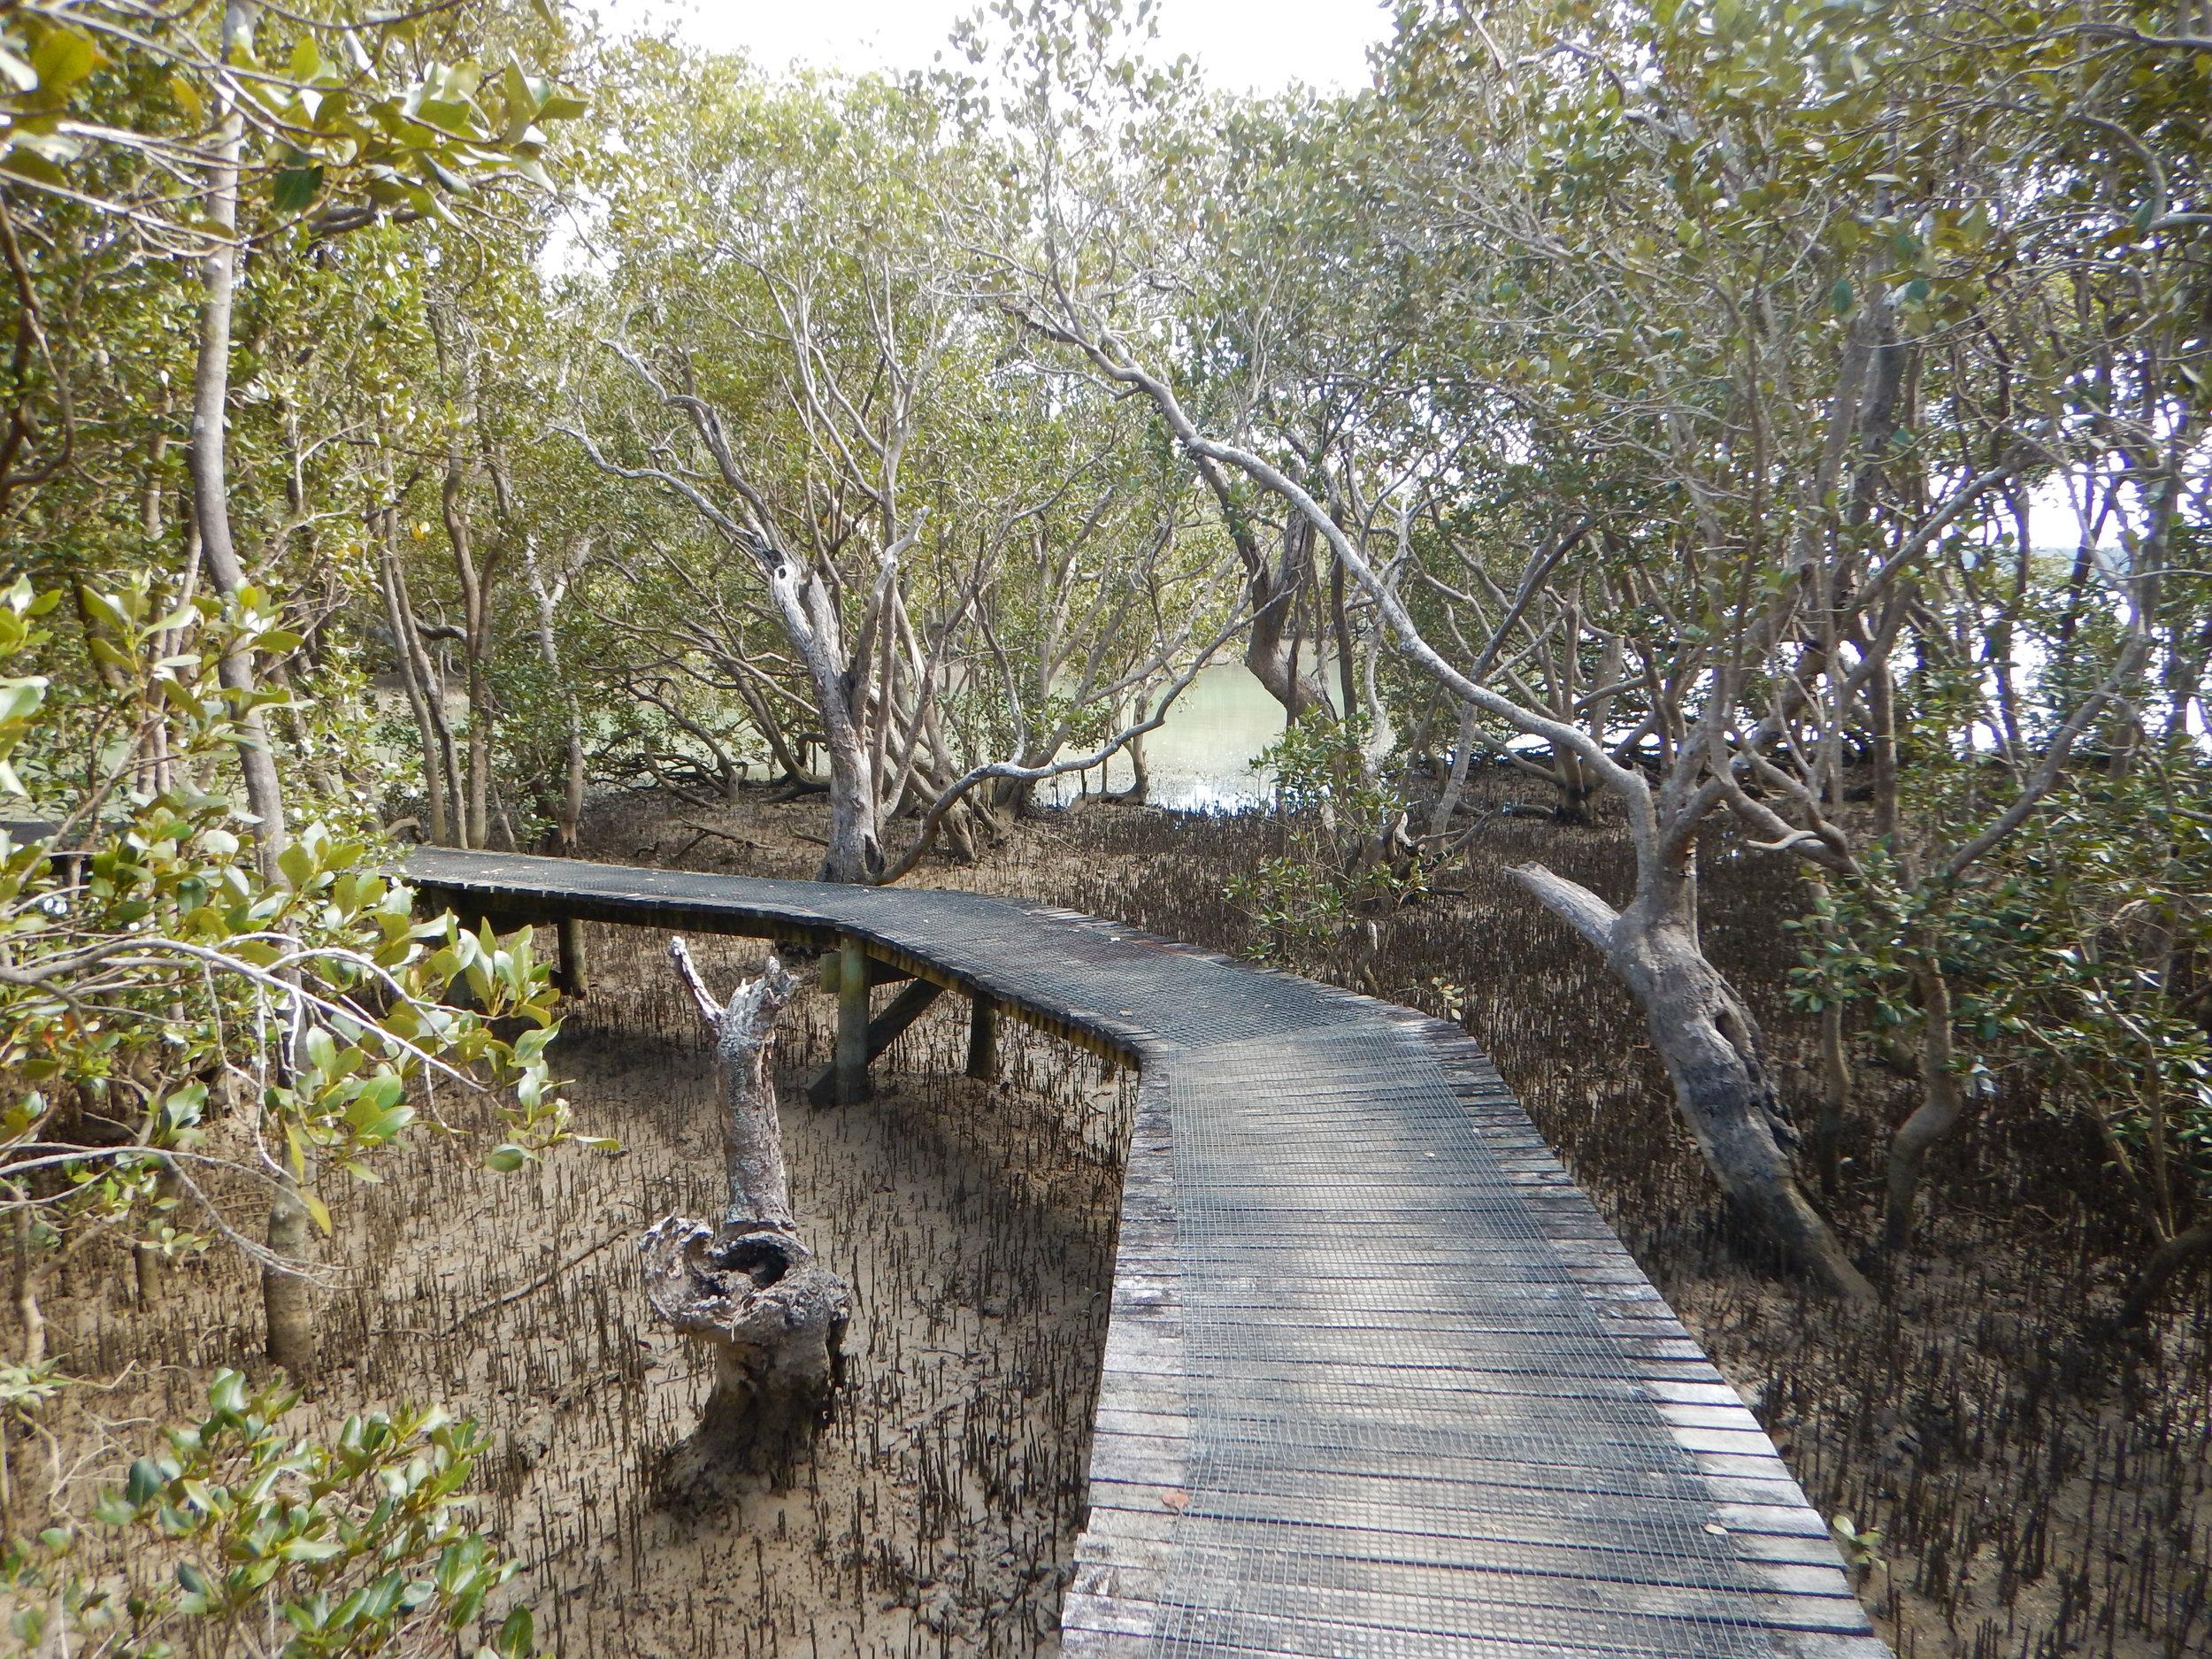 Boardwalk through the mangroves.